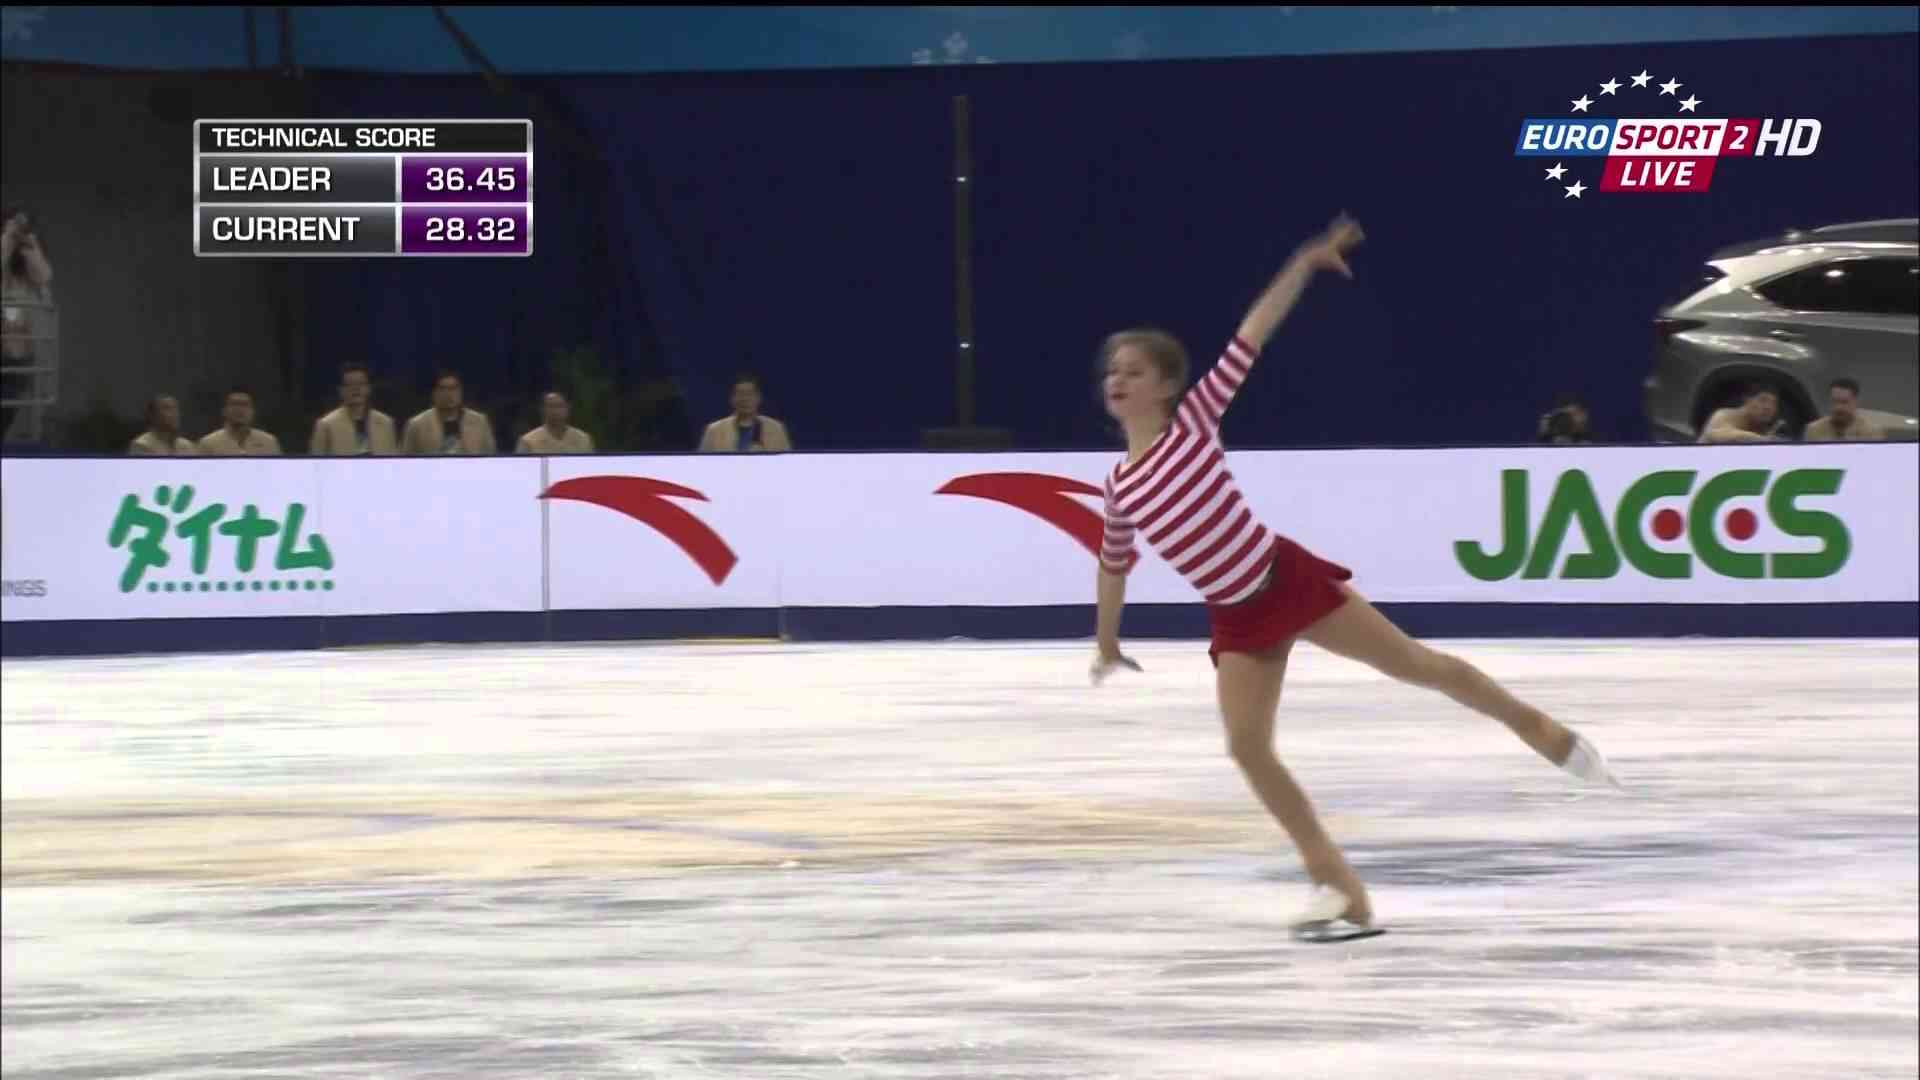 Julia Lipnitskaia 2014 Cup of China SP (Real FHD VIDEO) - YouTube